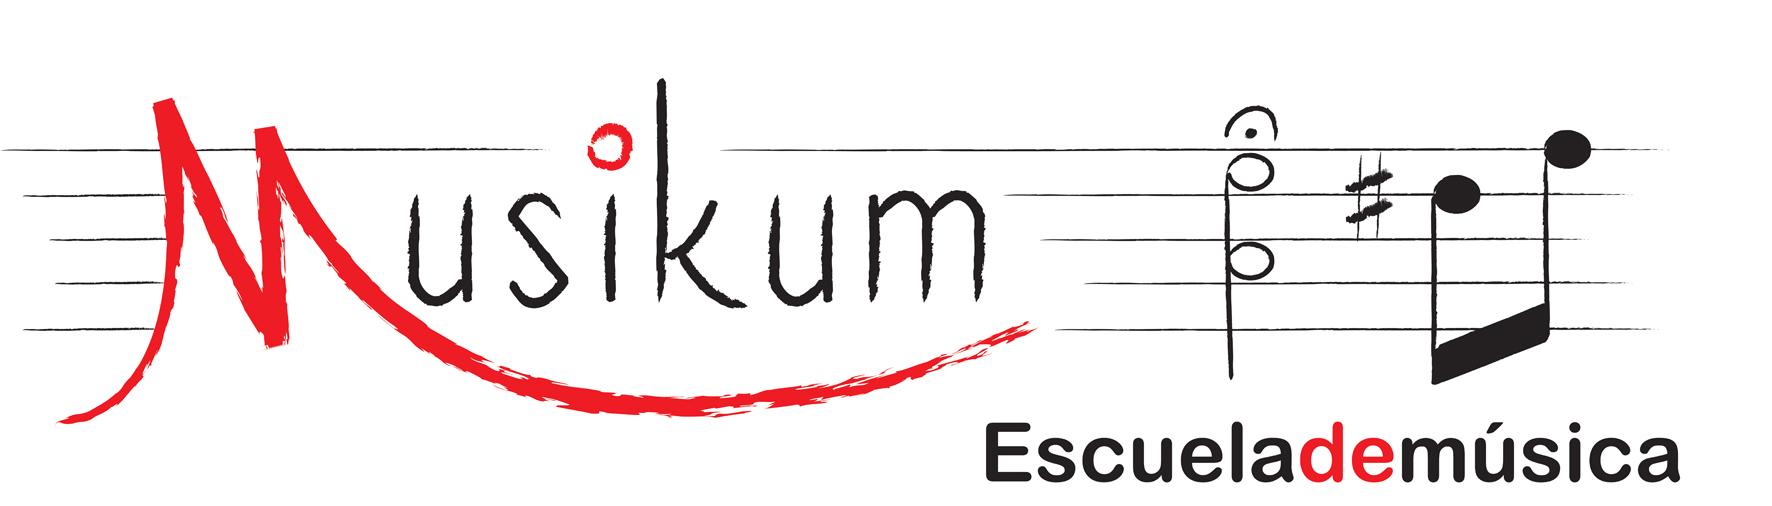 MUSIKUM sobre blanco 1 pq Musikum, escuela de musica